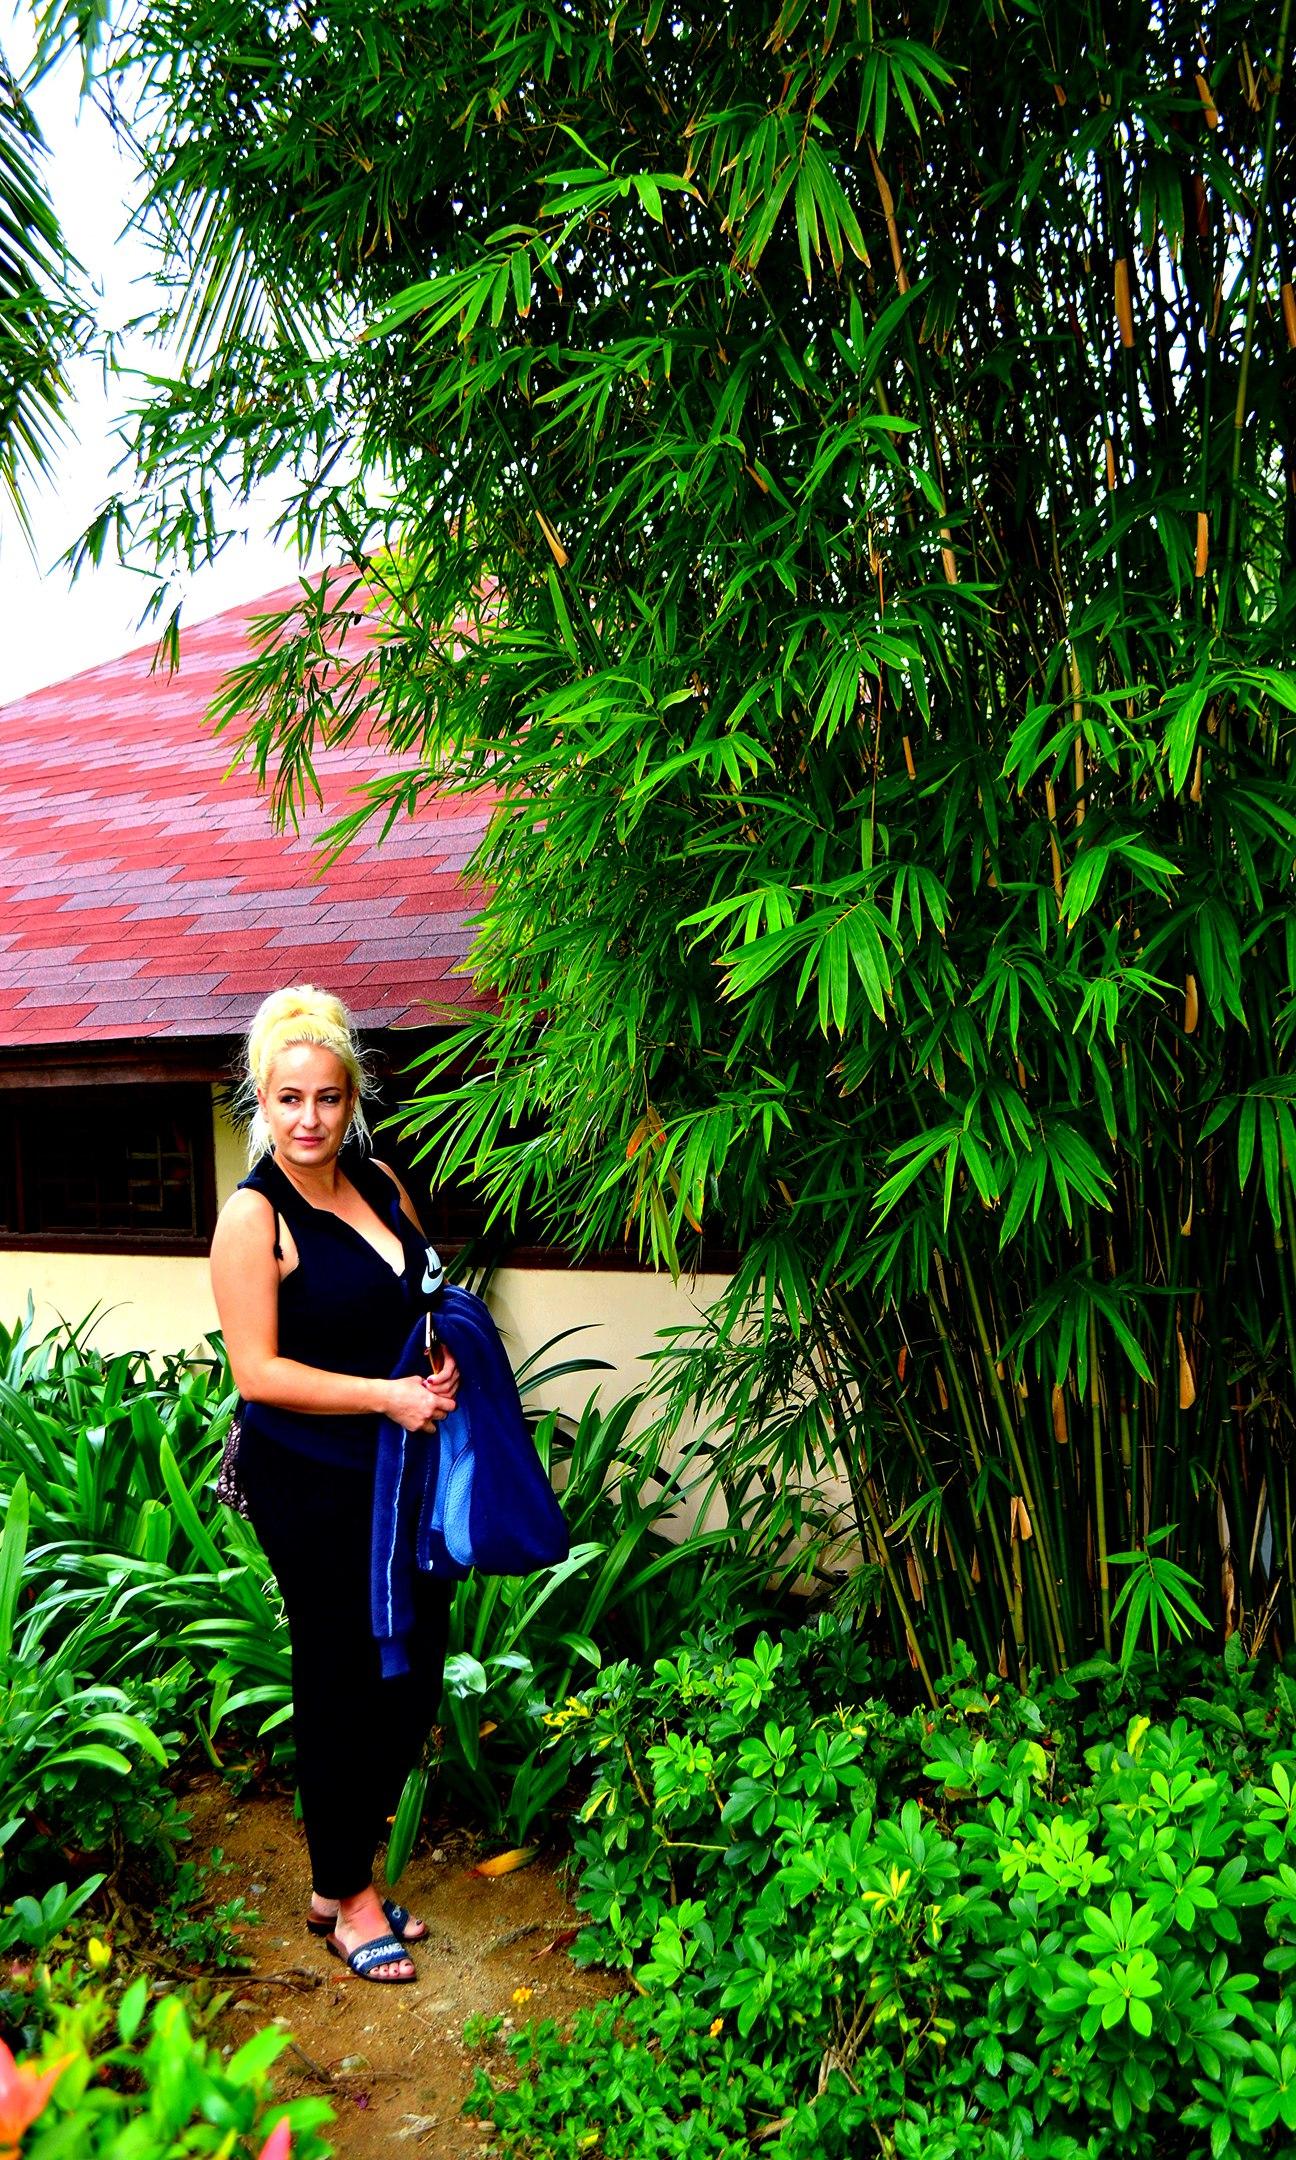 Елена Руденко (Валтея). Китай, о.Хайнань, г.Санья. (фото) - Страница 6 YdTuCbCjRXM